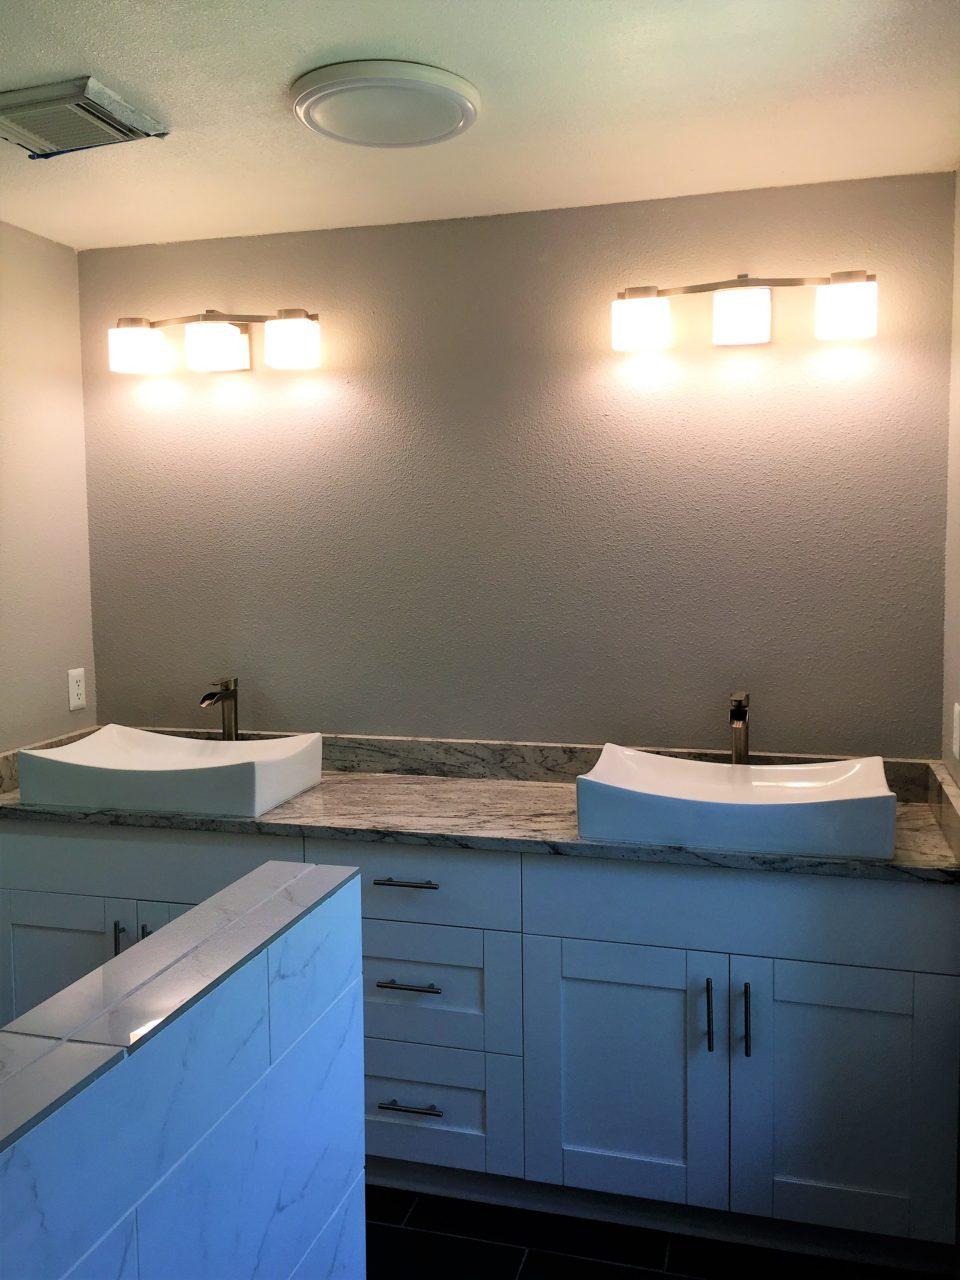 Affordable Bathroom Remodeling San Antonio